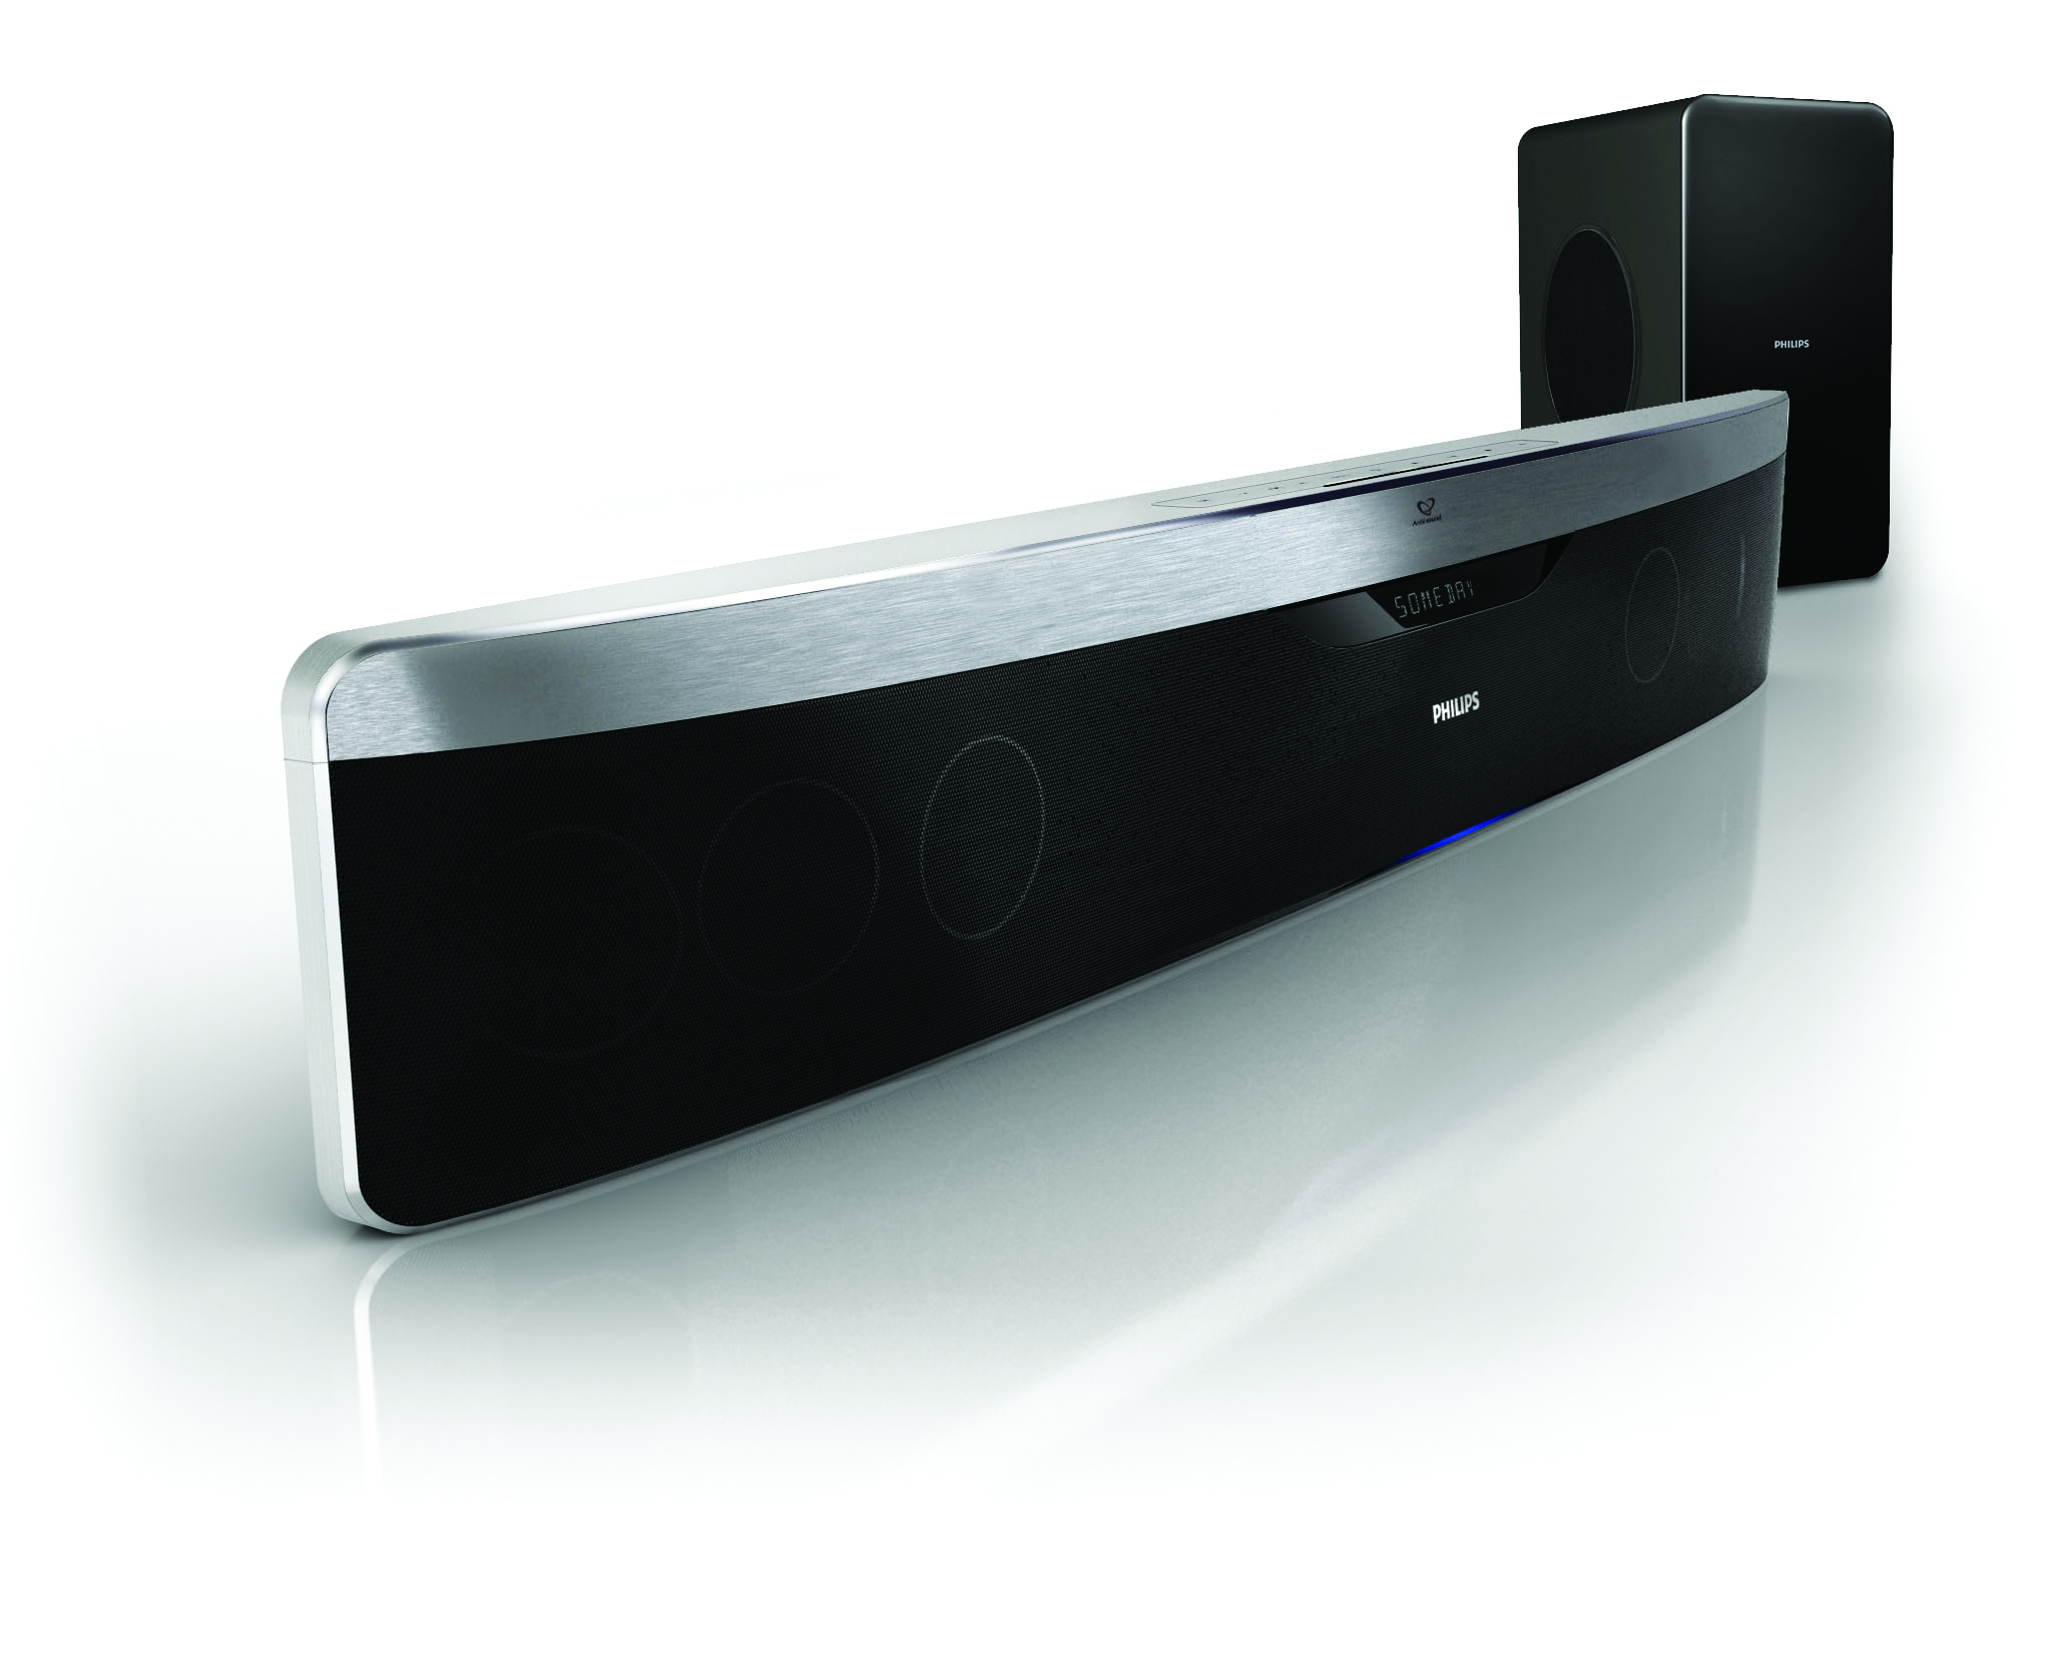 Philips soundbar 1 1 hts9140 prijzen tweakers - Meuble tv samsung avec accroche barre de son ...